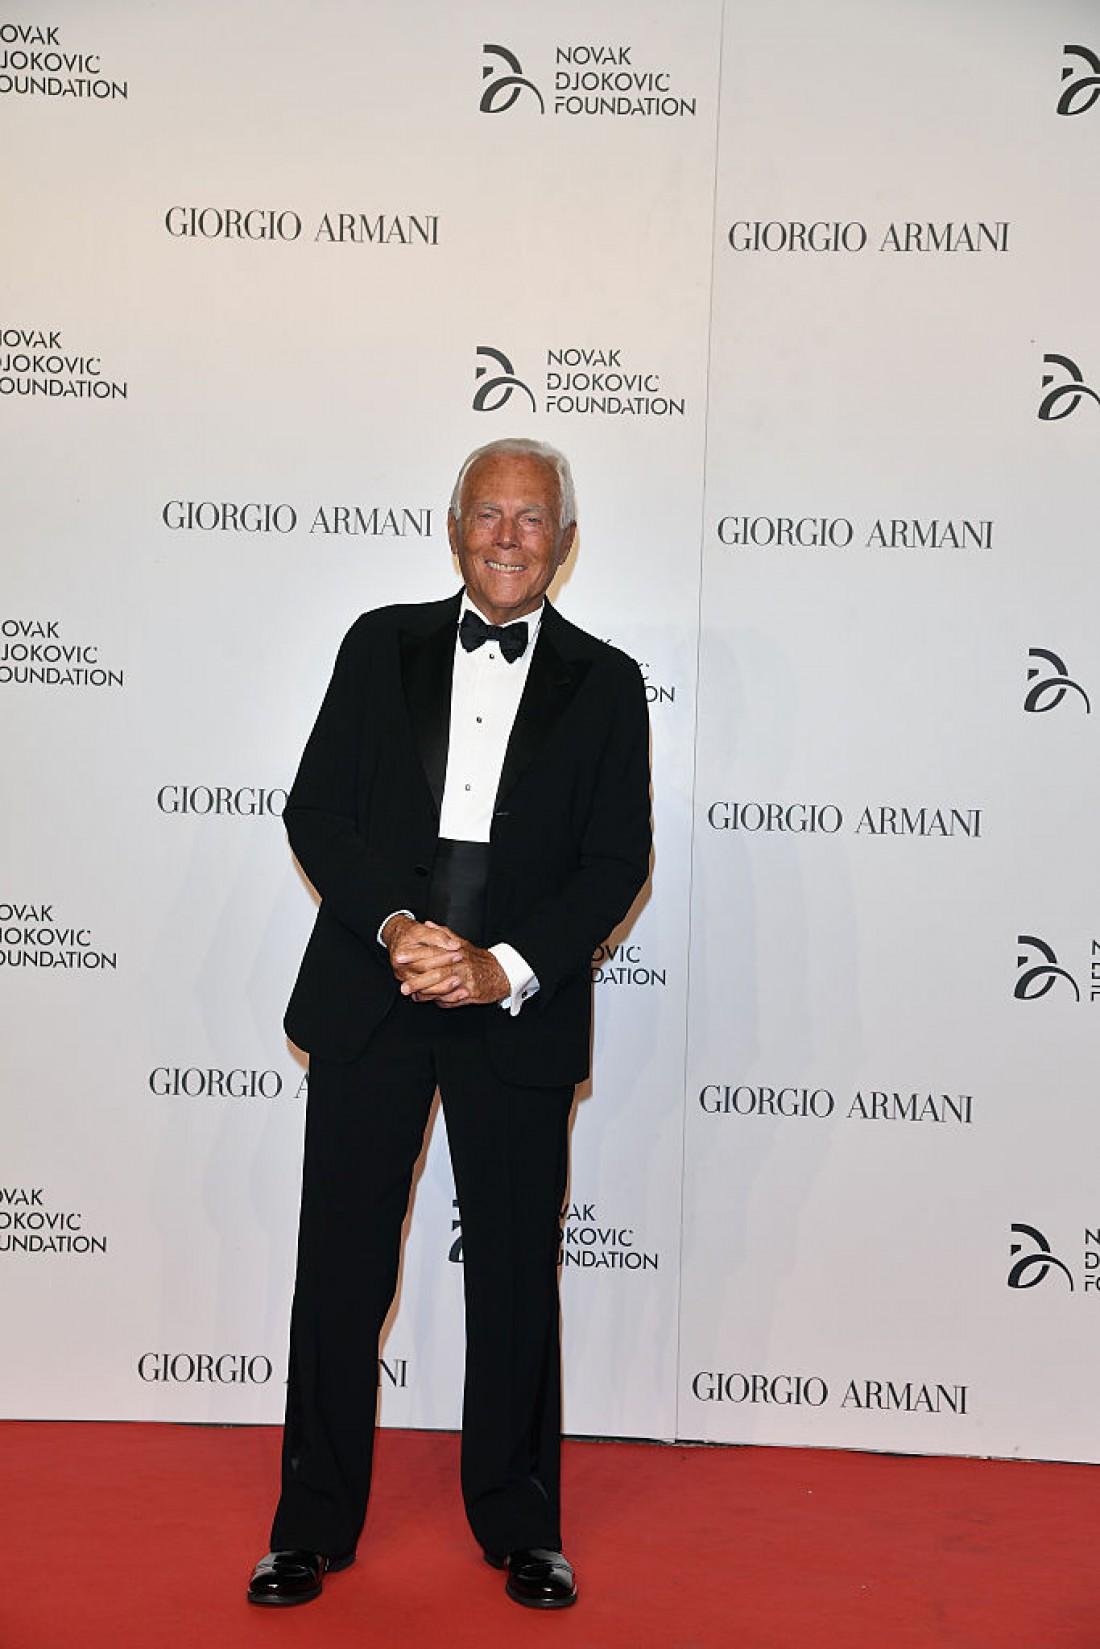 Джорджо Армани: 10 правил успеха